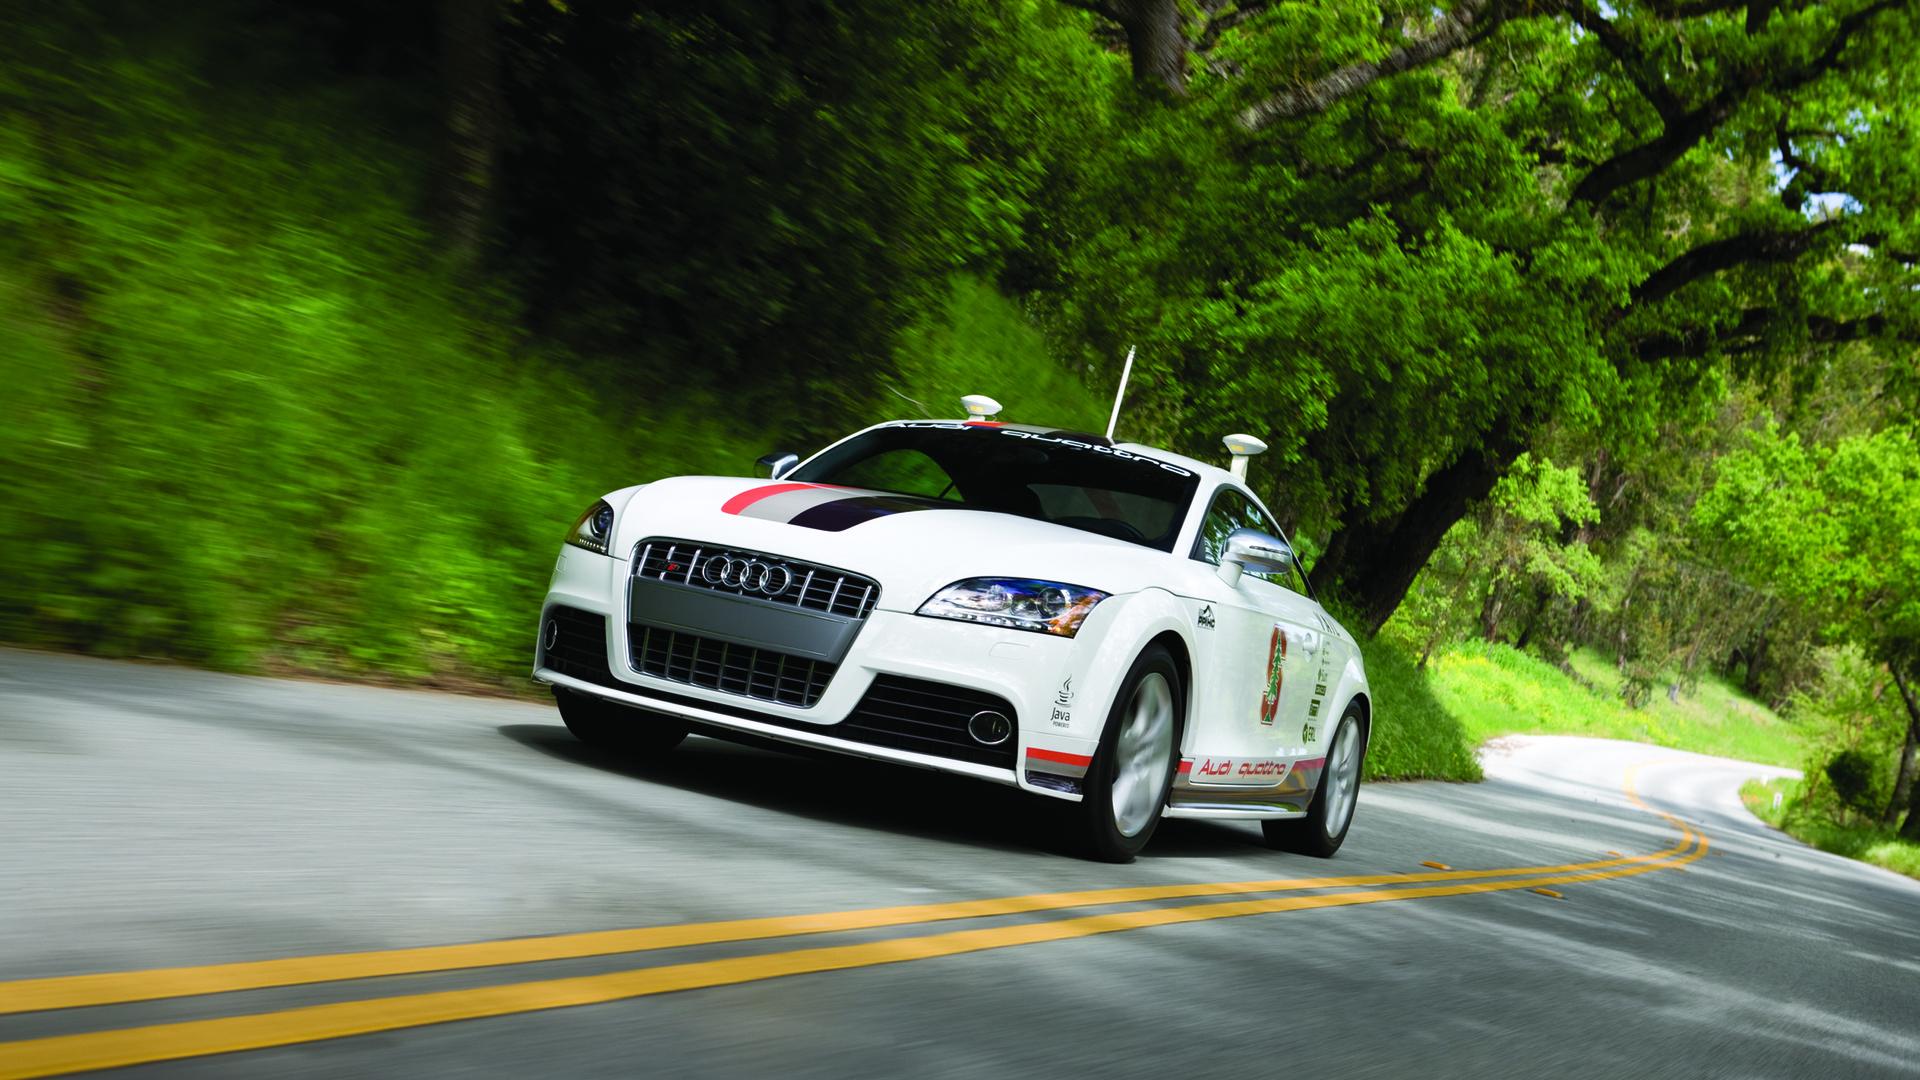 Auto, auto quattro, auditts, cars, обои авто, audi wallpapers, audi tt, wallpapers auto